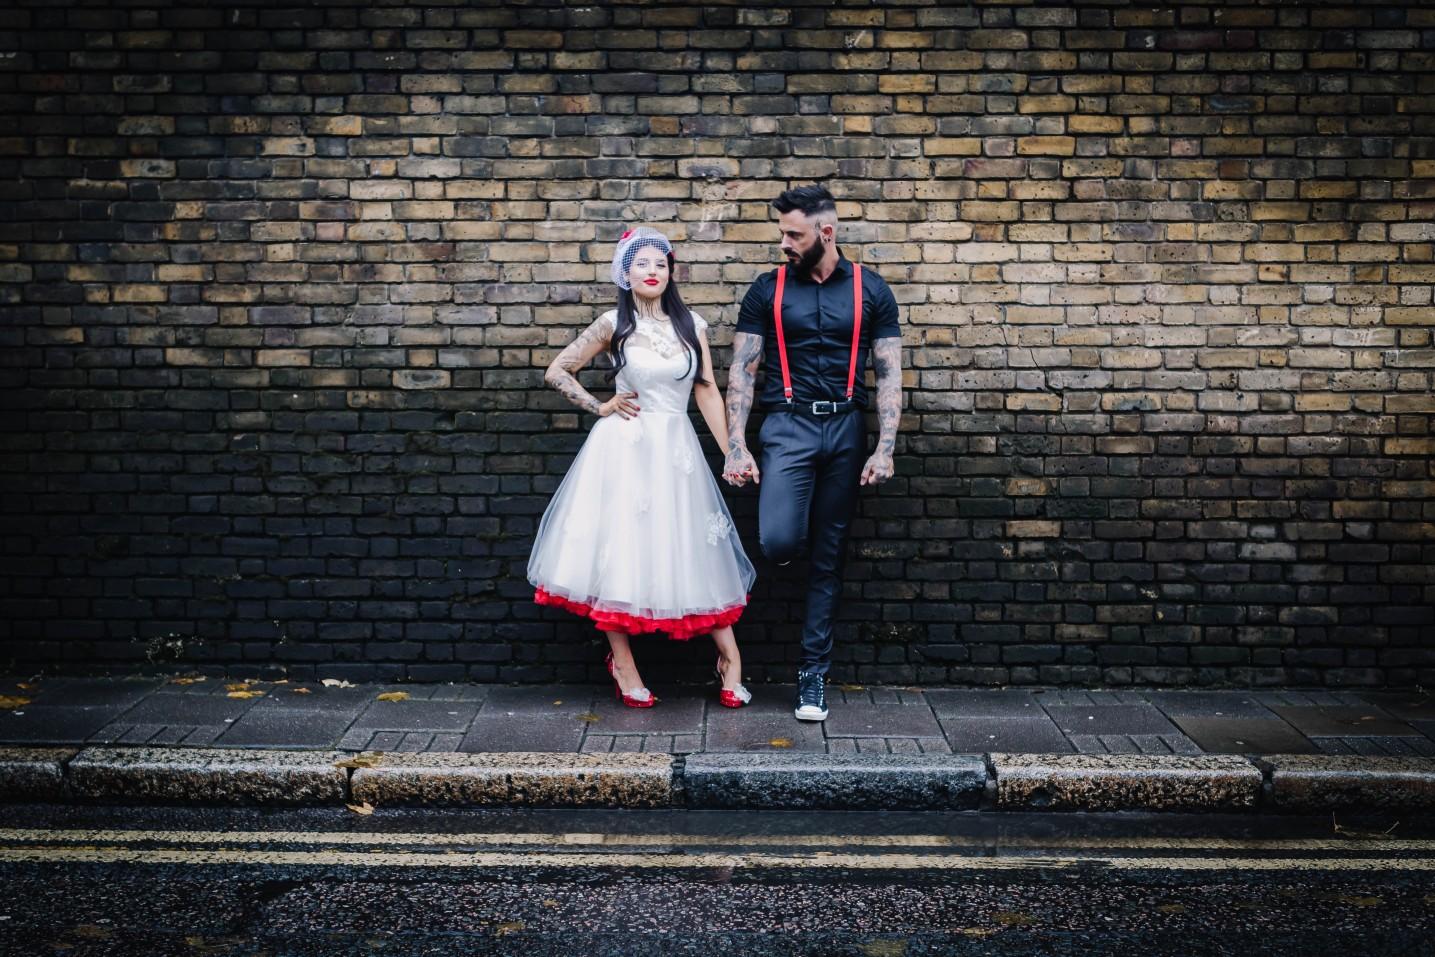 alternative couple- rockabilly bride - retro wedding dress with red underskirt